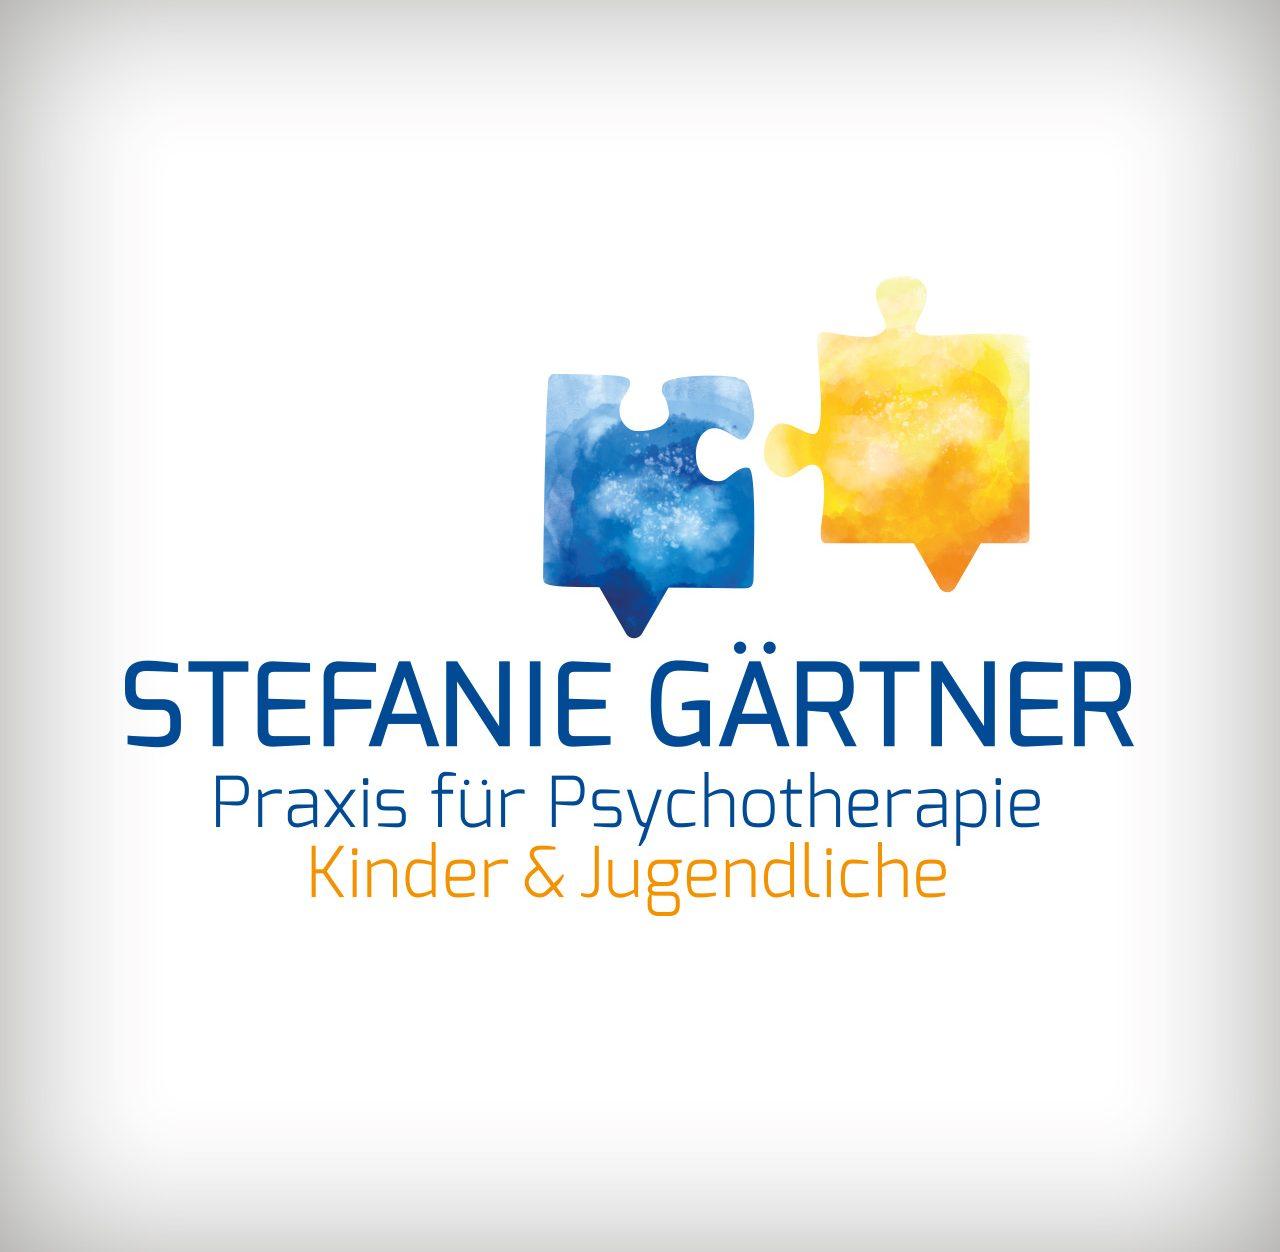 Praxis_Psychotherapie_1280x1280